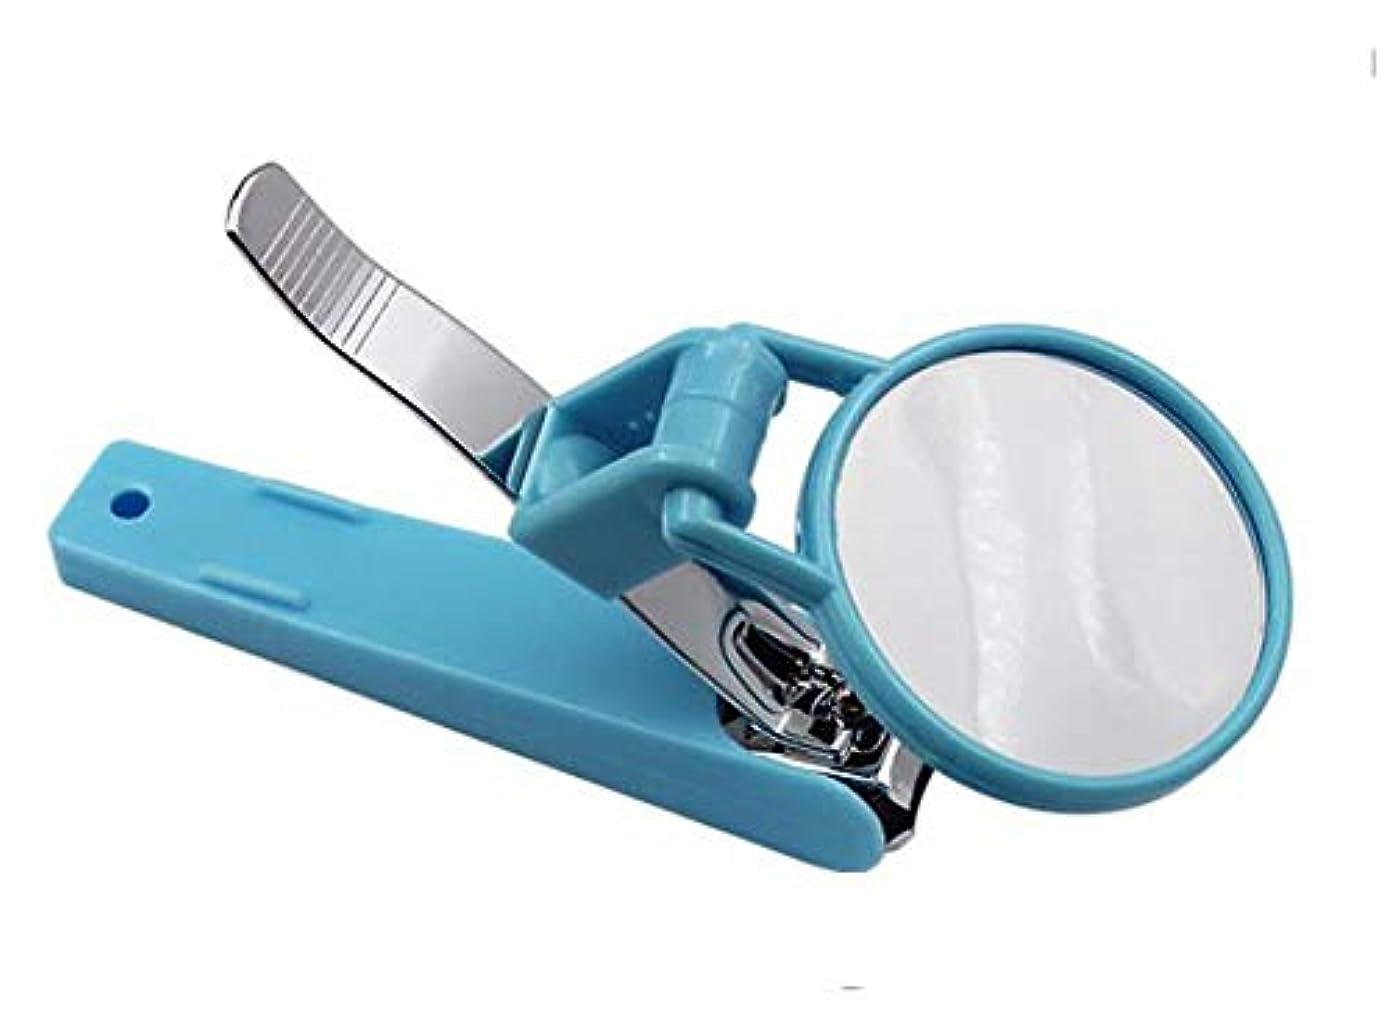 SZM ルーペ付き爪切り ネイルケア 高齢者向け 虫眼鏡 コンパクト 携帯便利 360度回転